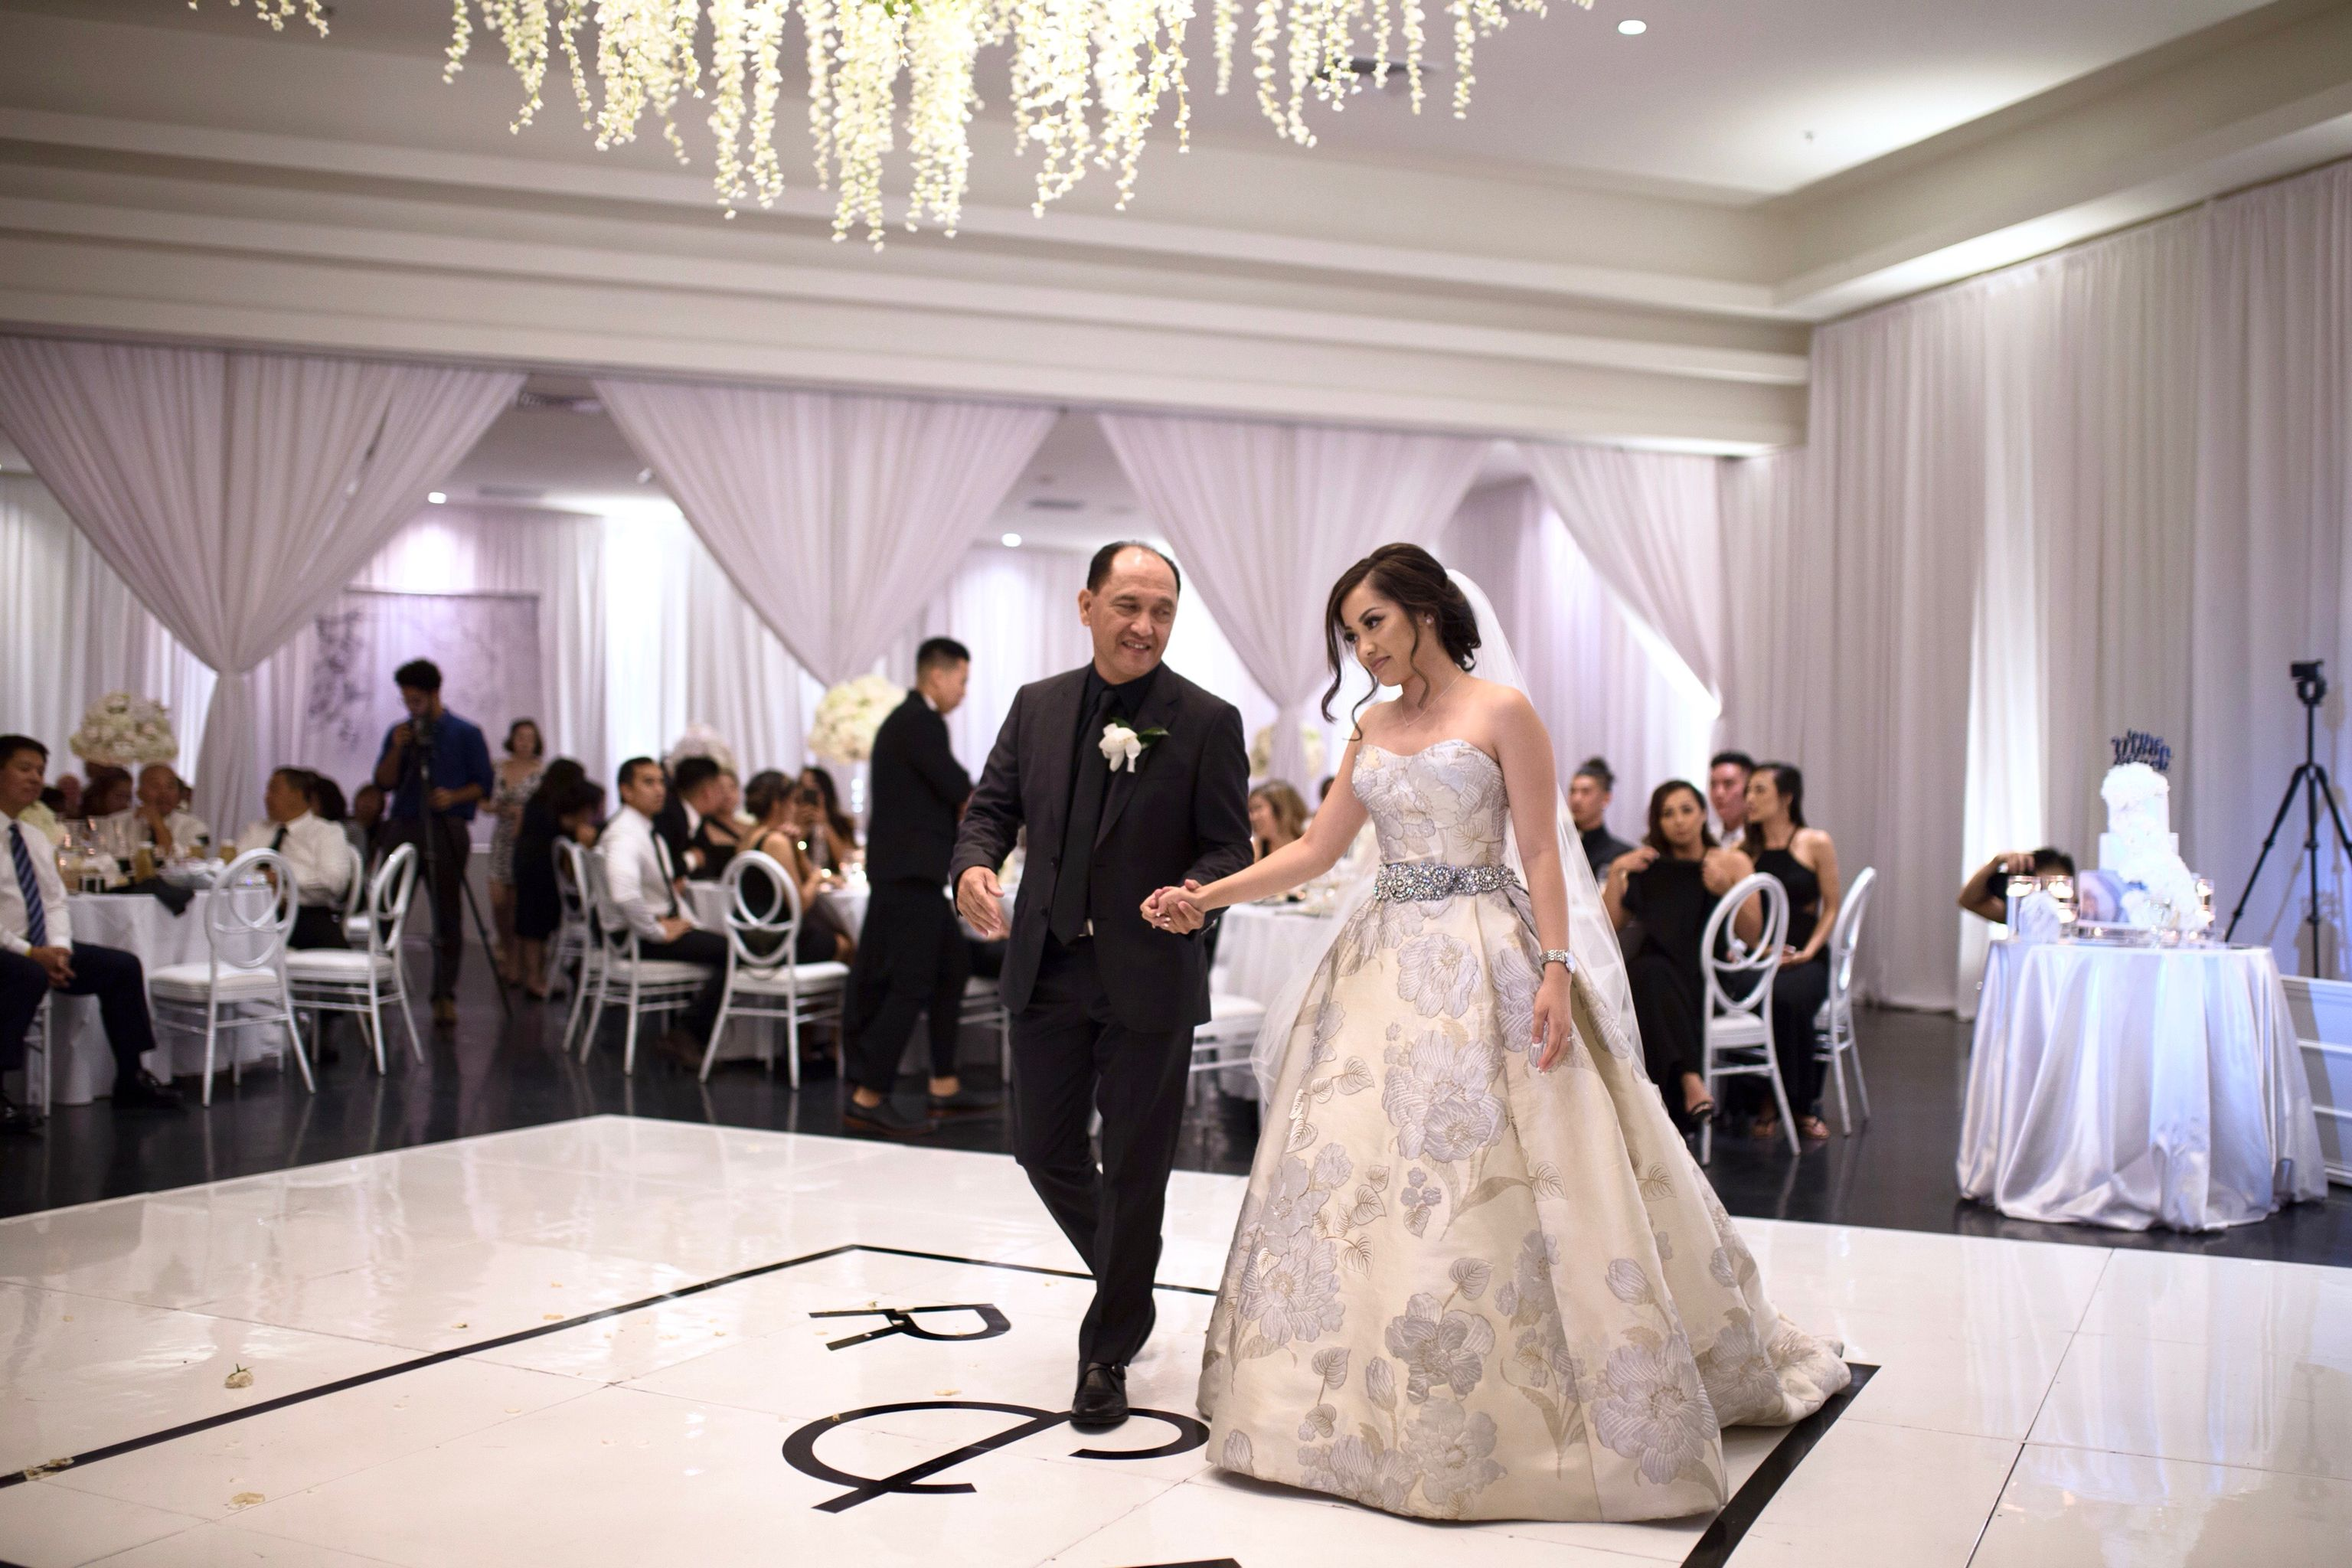 Oleg Cassini Bridal Dress   Black and White Wedding   Black and ...